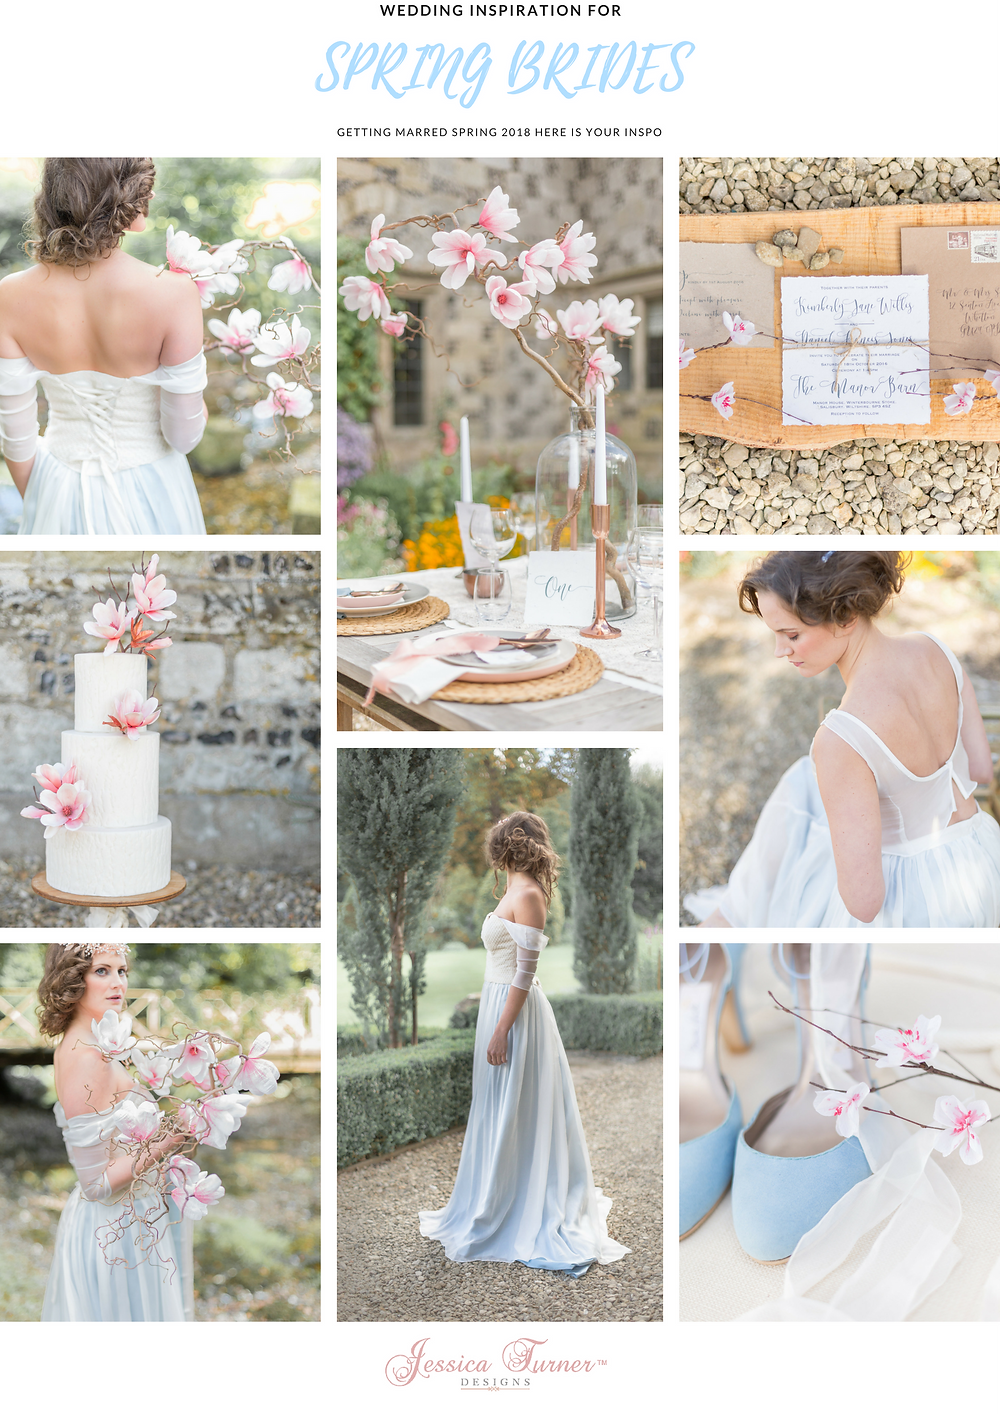 Spring Wedding Inspiration 2018